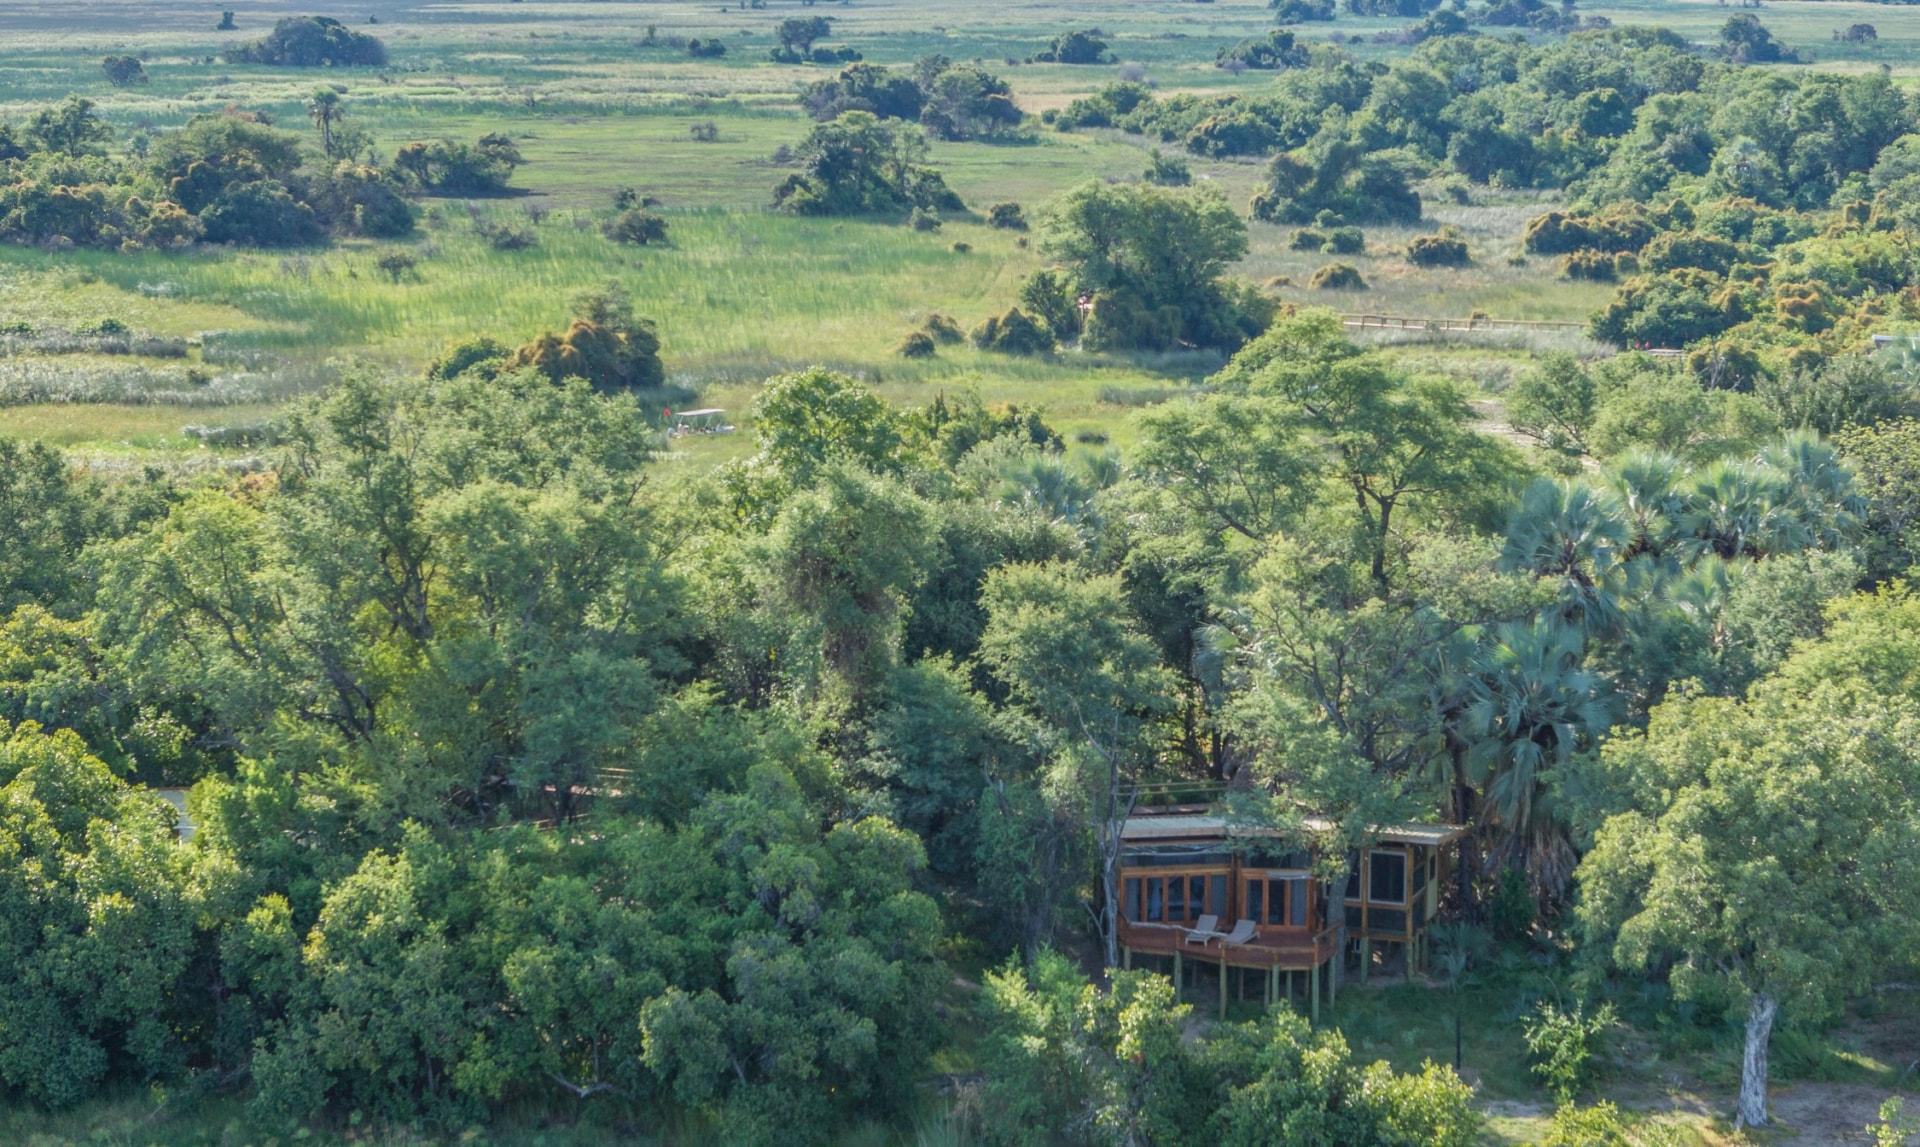 Lage des Camp Okavango